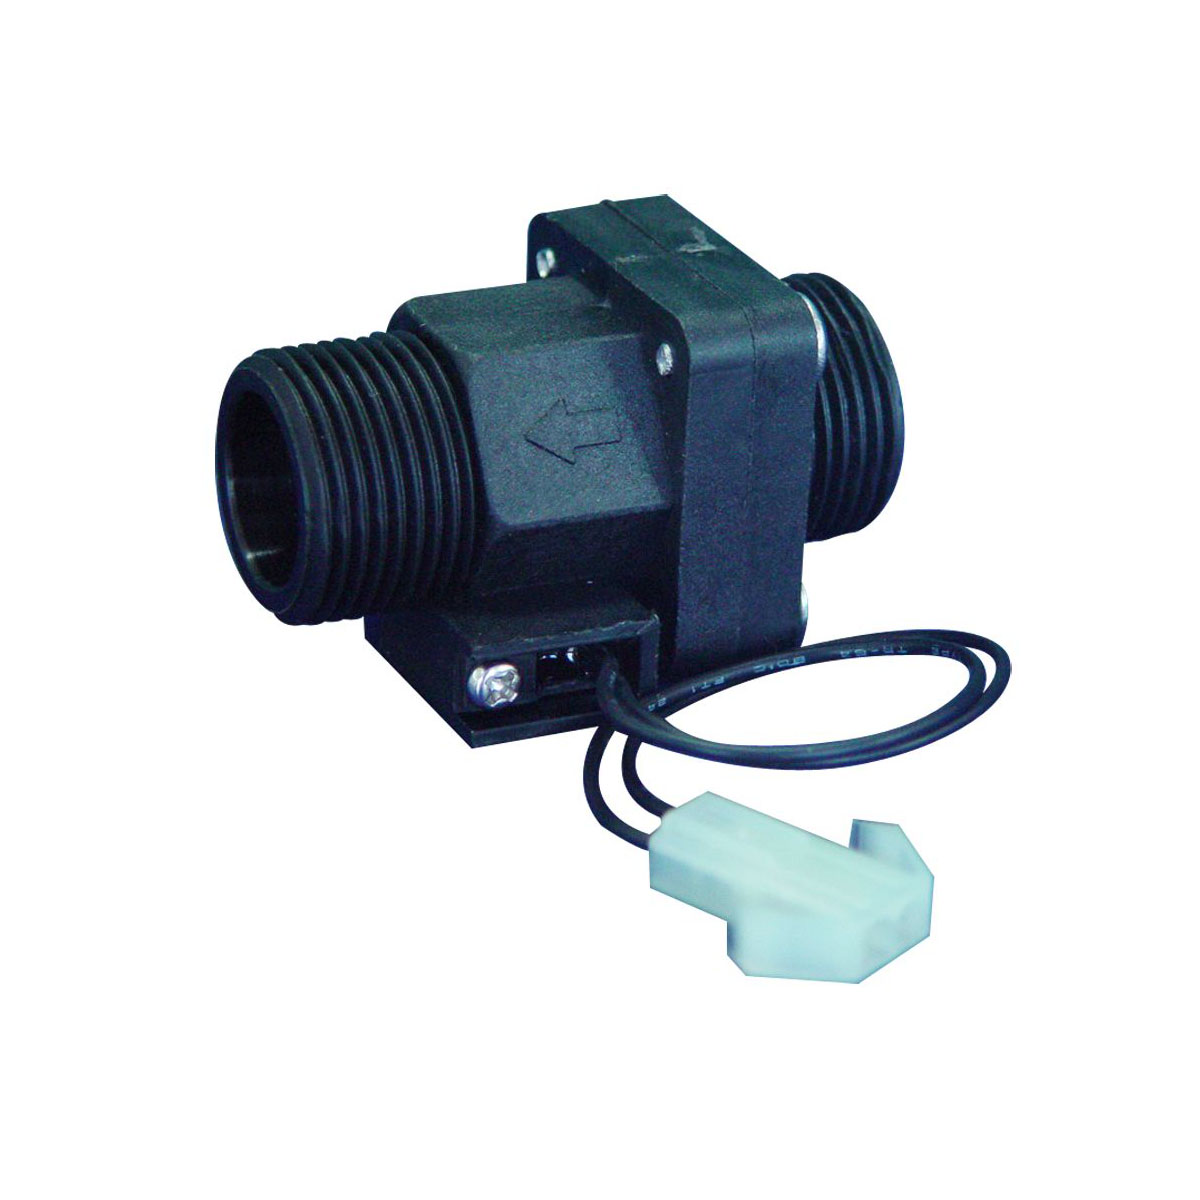 IMARI IM-J502 สวิทช์การไหล สำหรับงานน้ำ